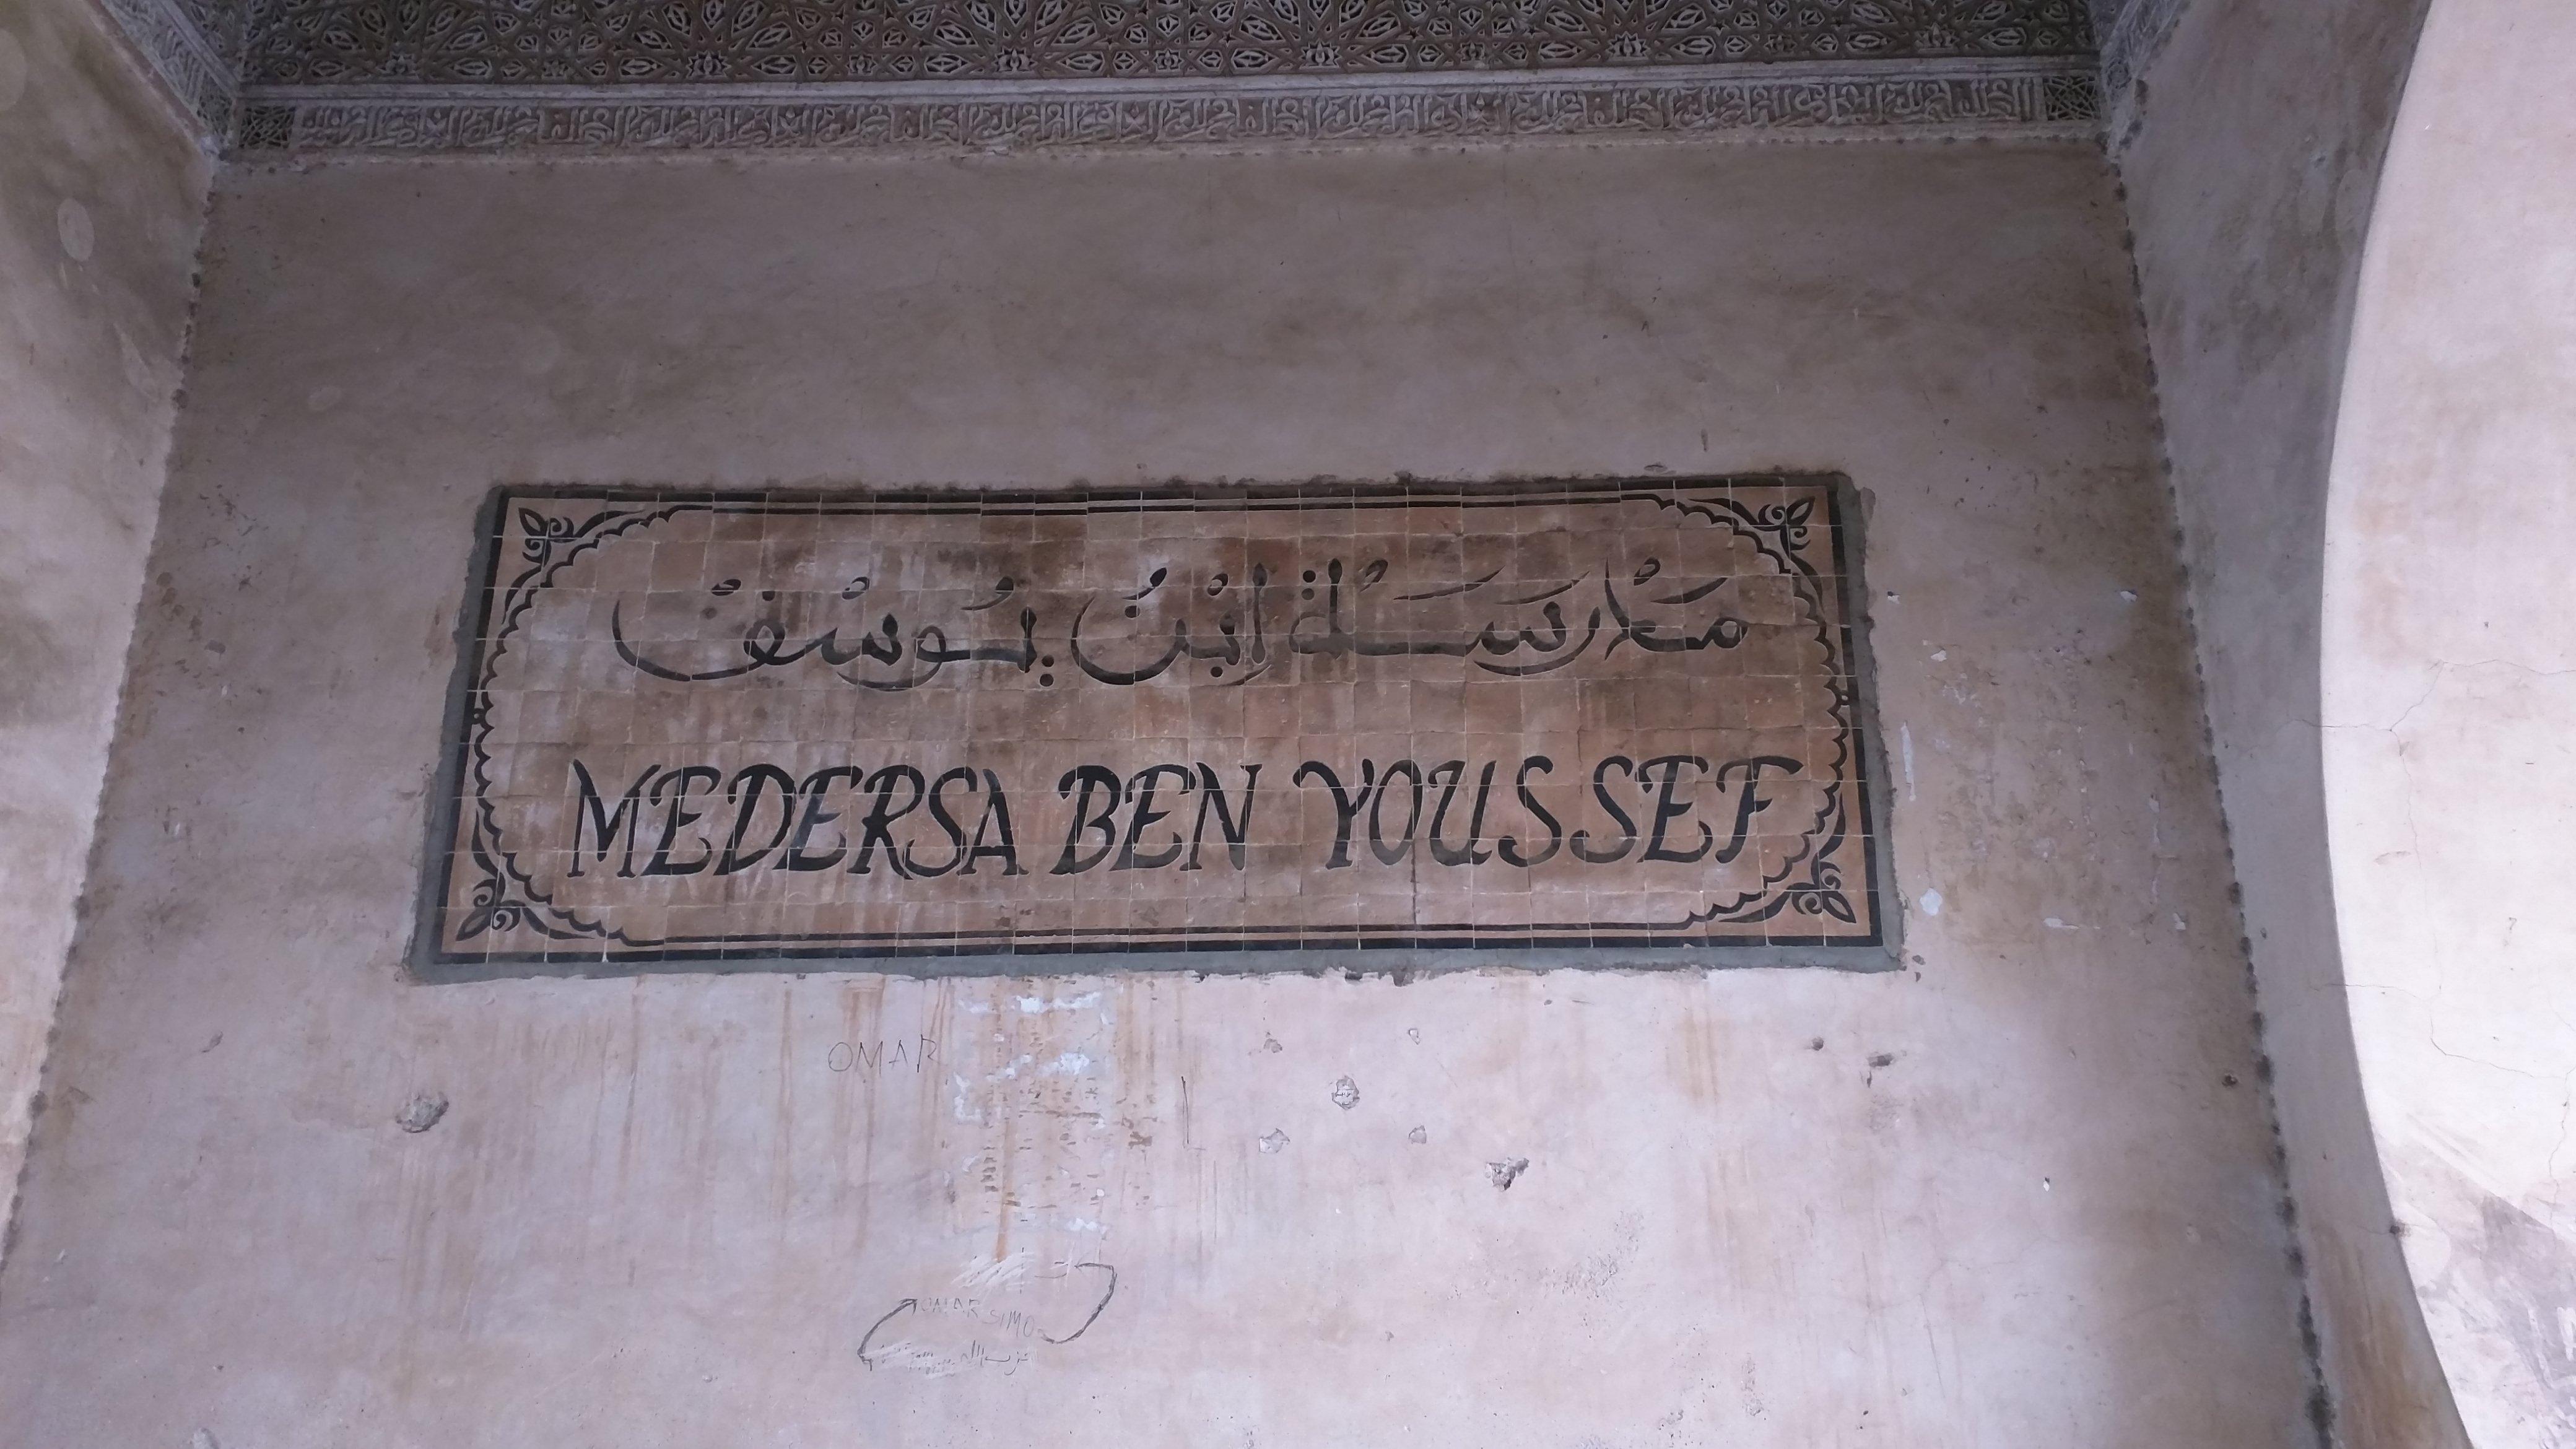 Madrassah Ben Youssef.